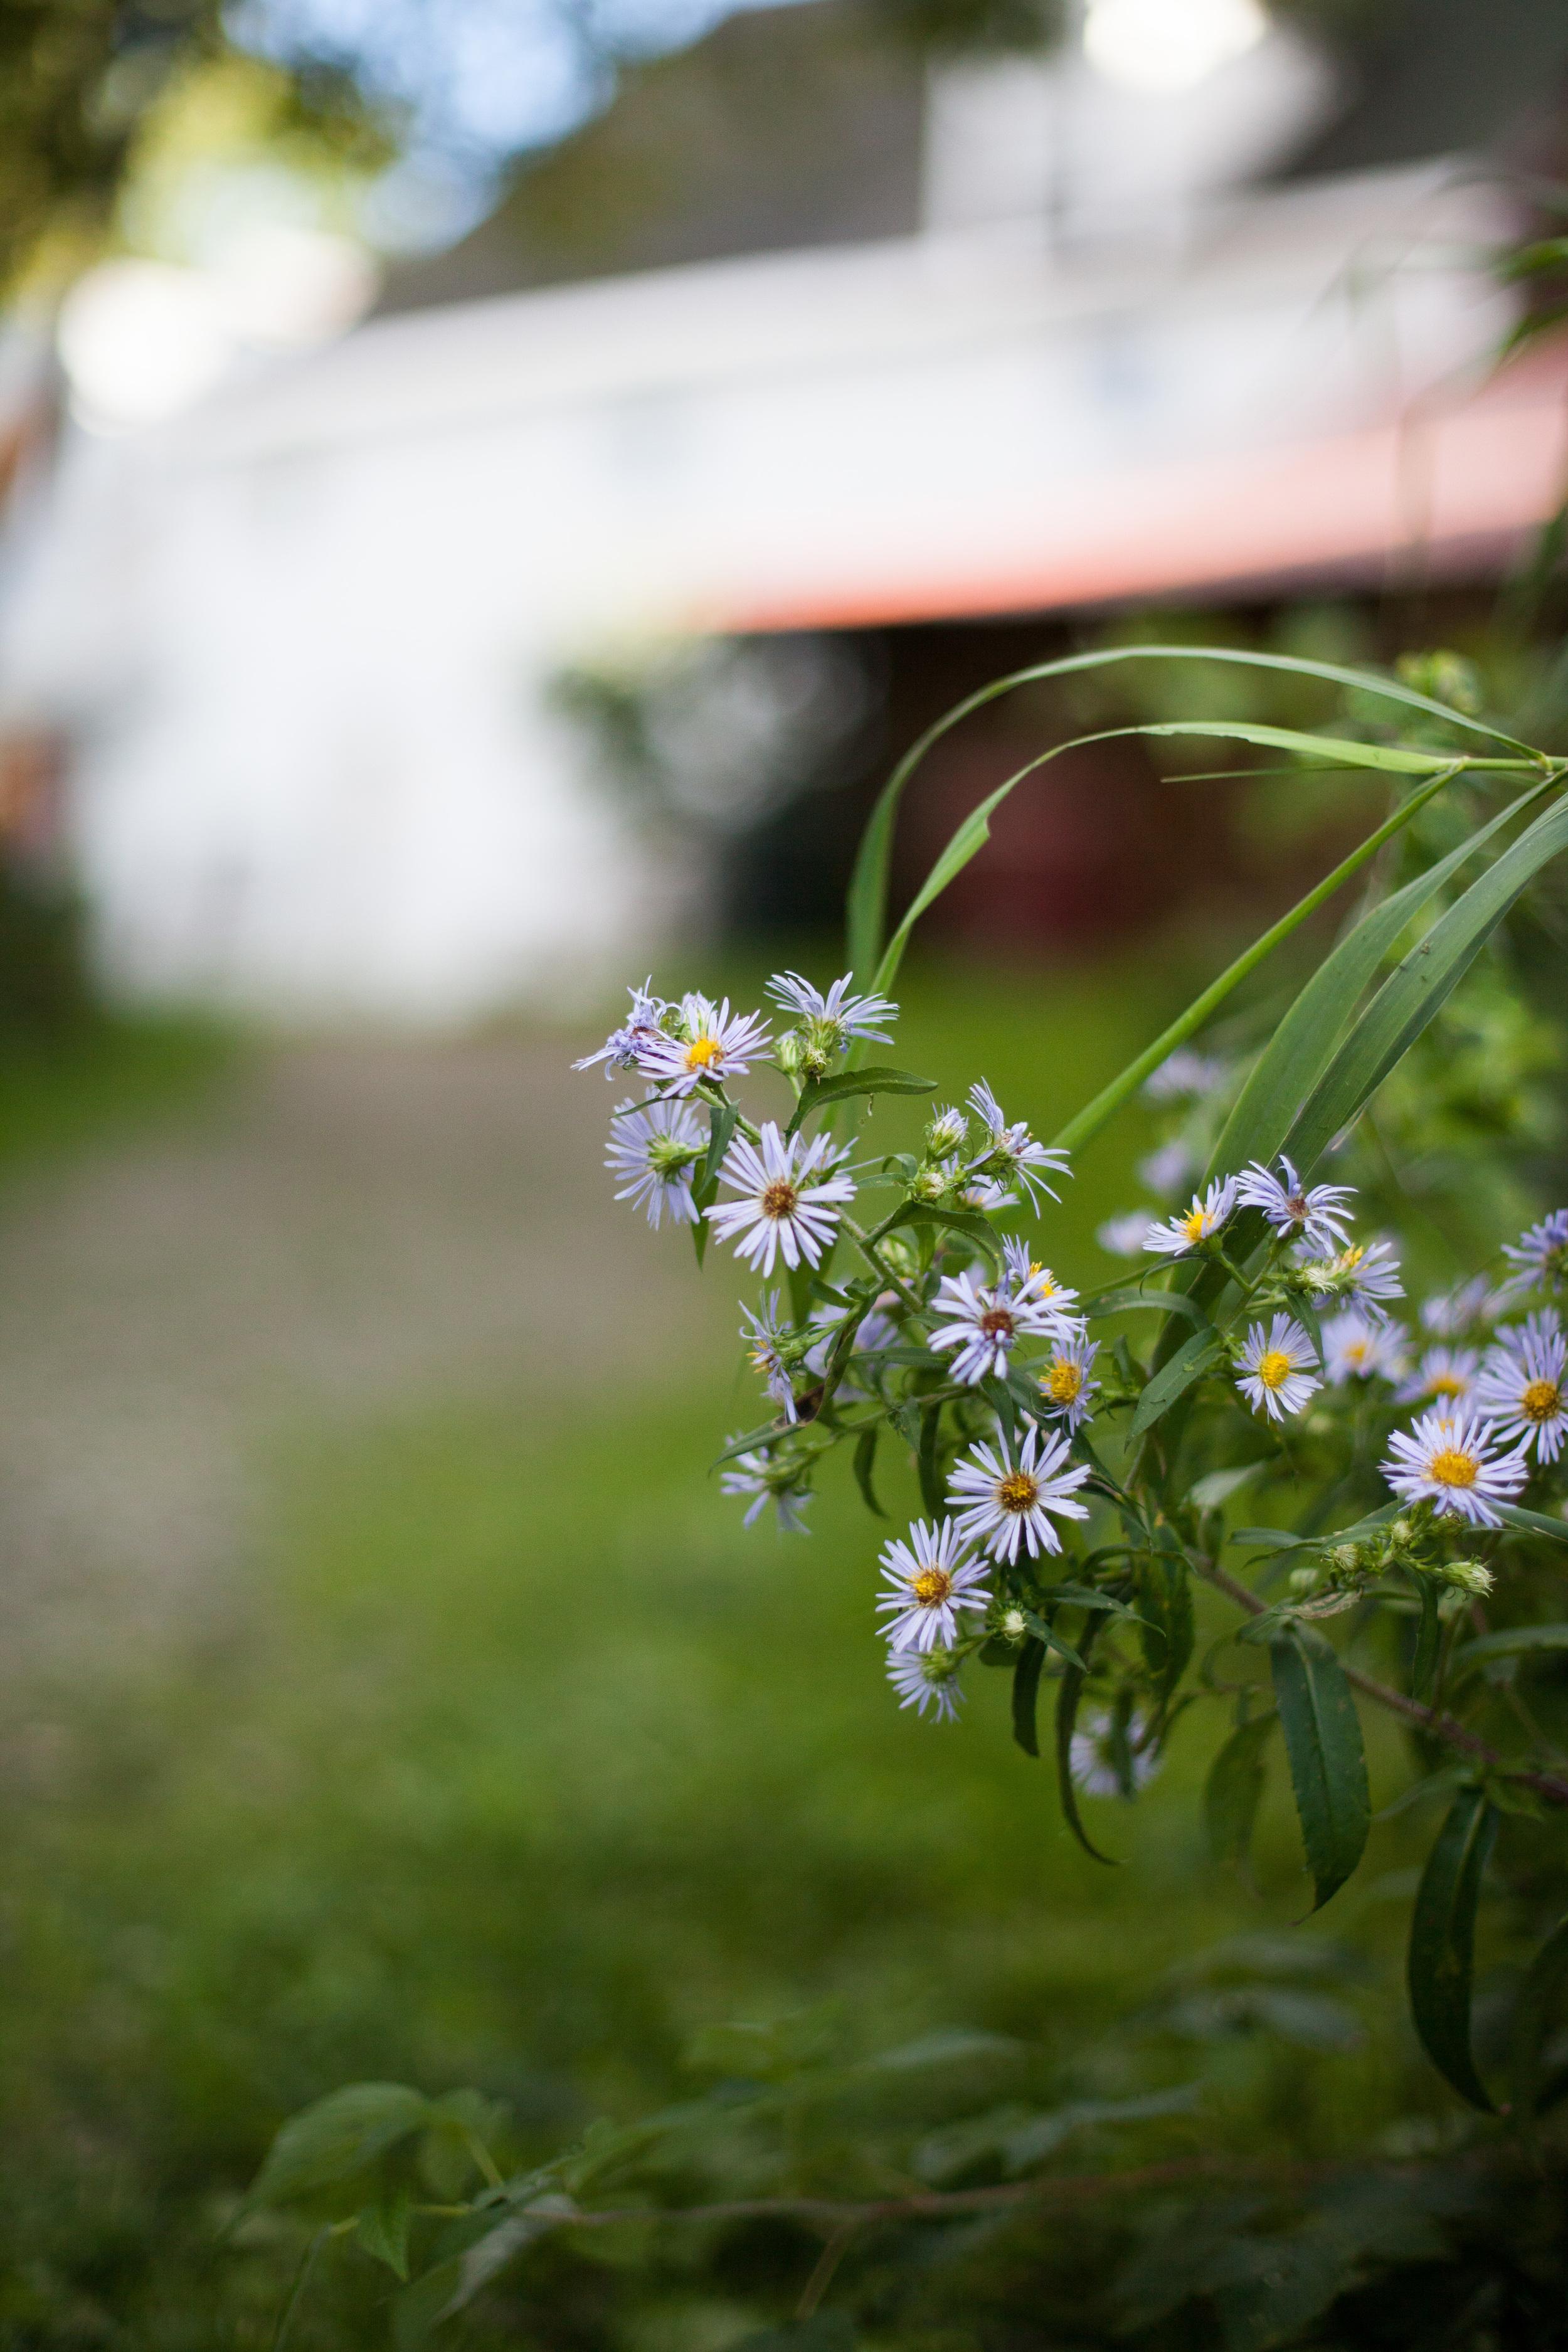 Flora abounds...